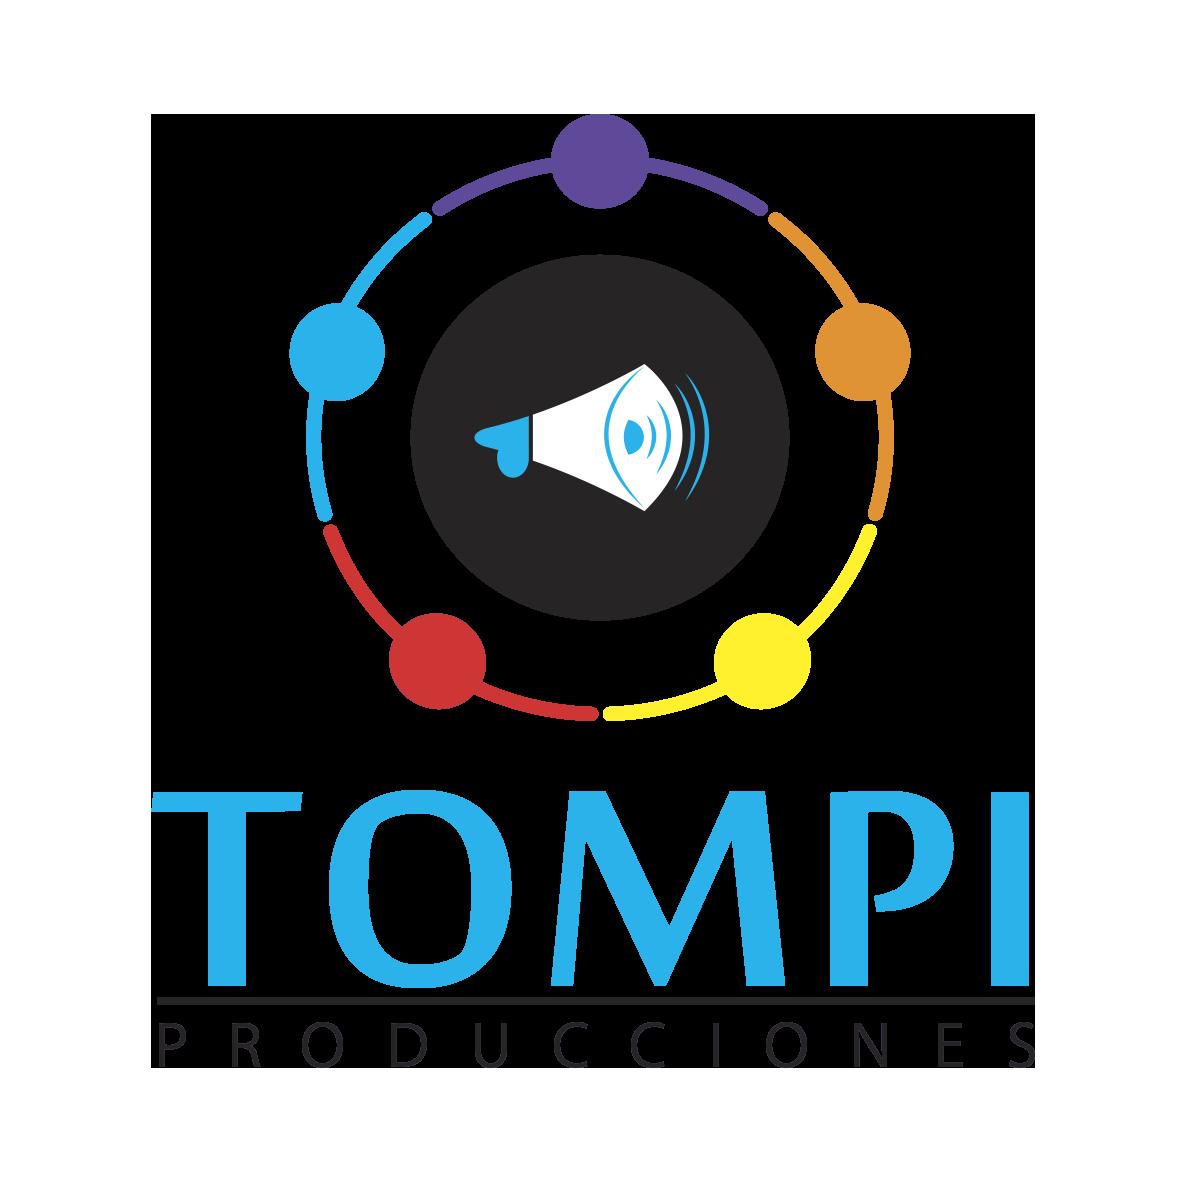 TOMPI-Producciones